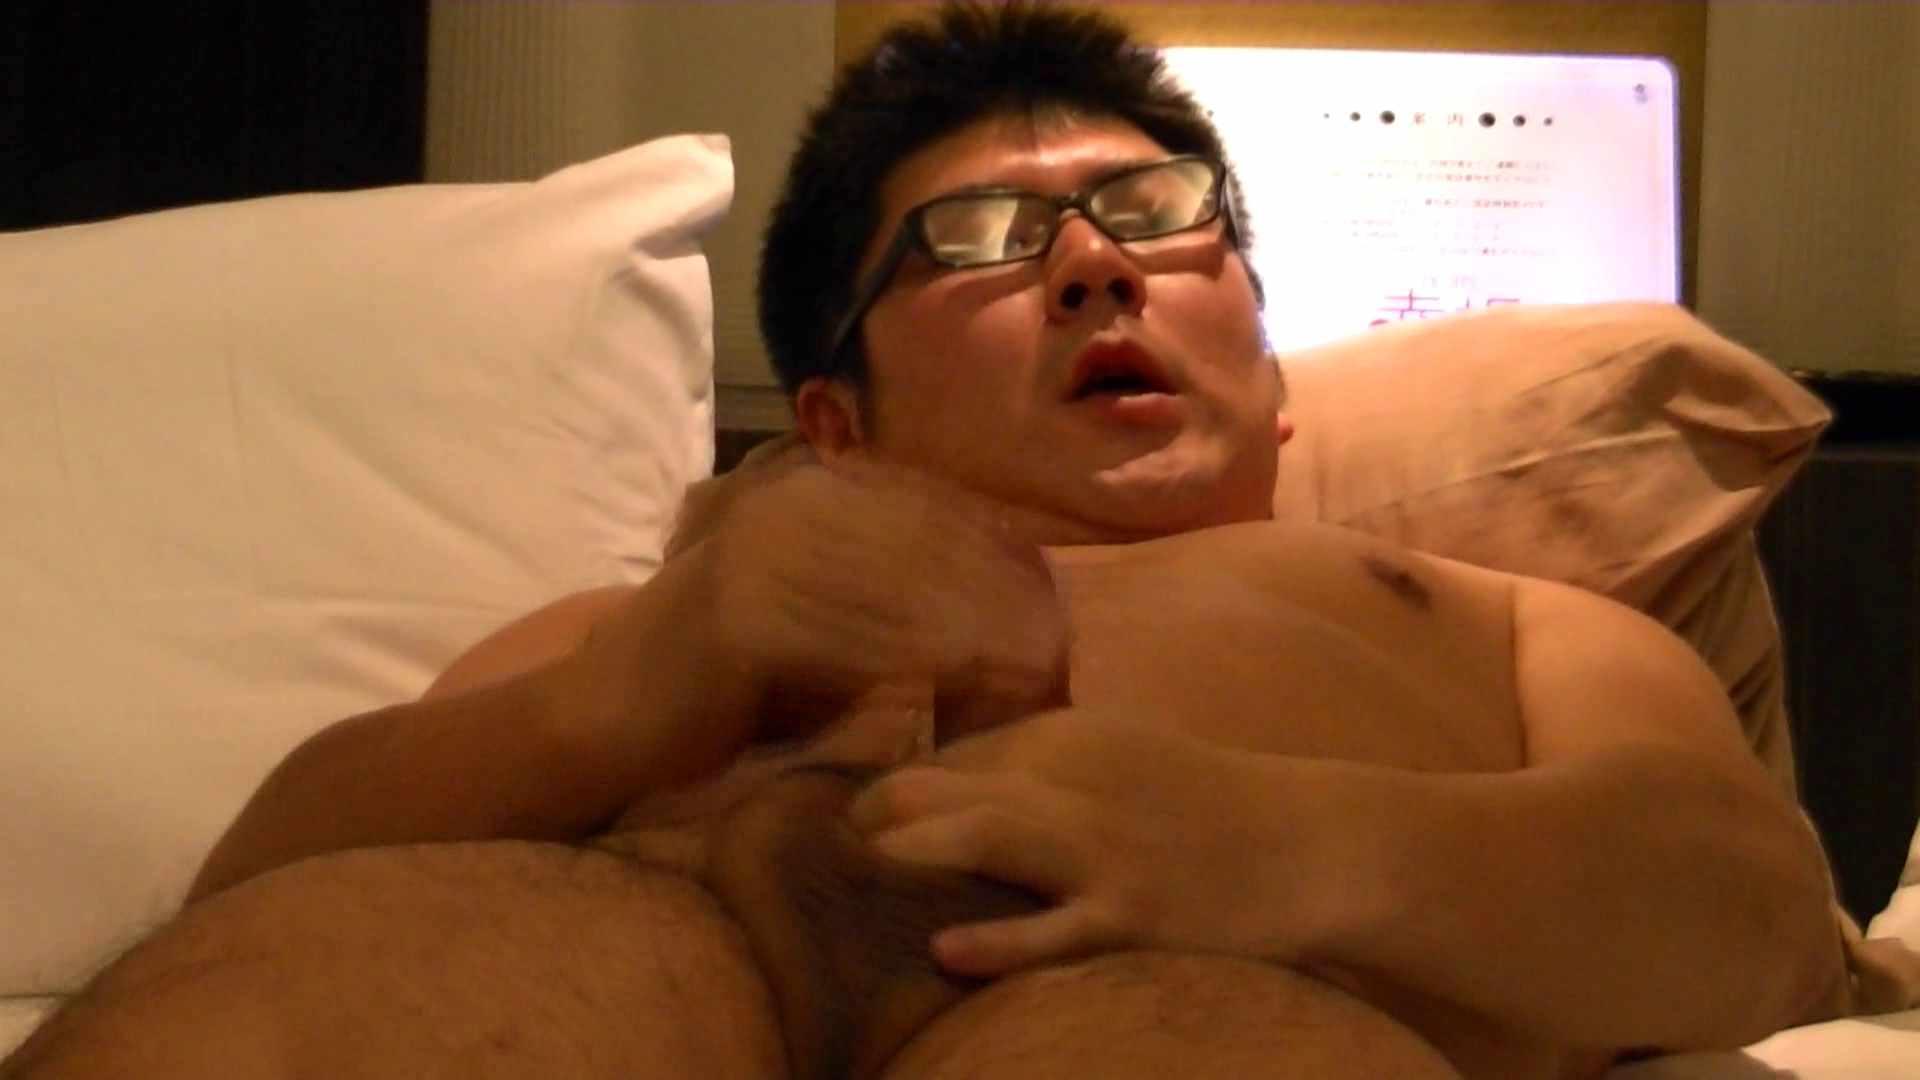 Mr.オナックスさん投稿!HD 貴方のオナニー三万円で撮影させてください。VOL.03 後編 完全無修正版 | ガチムチマッチョ系男子  106枚 13